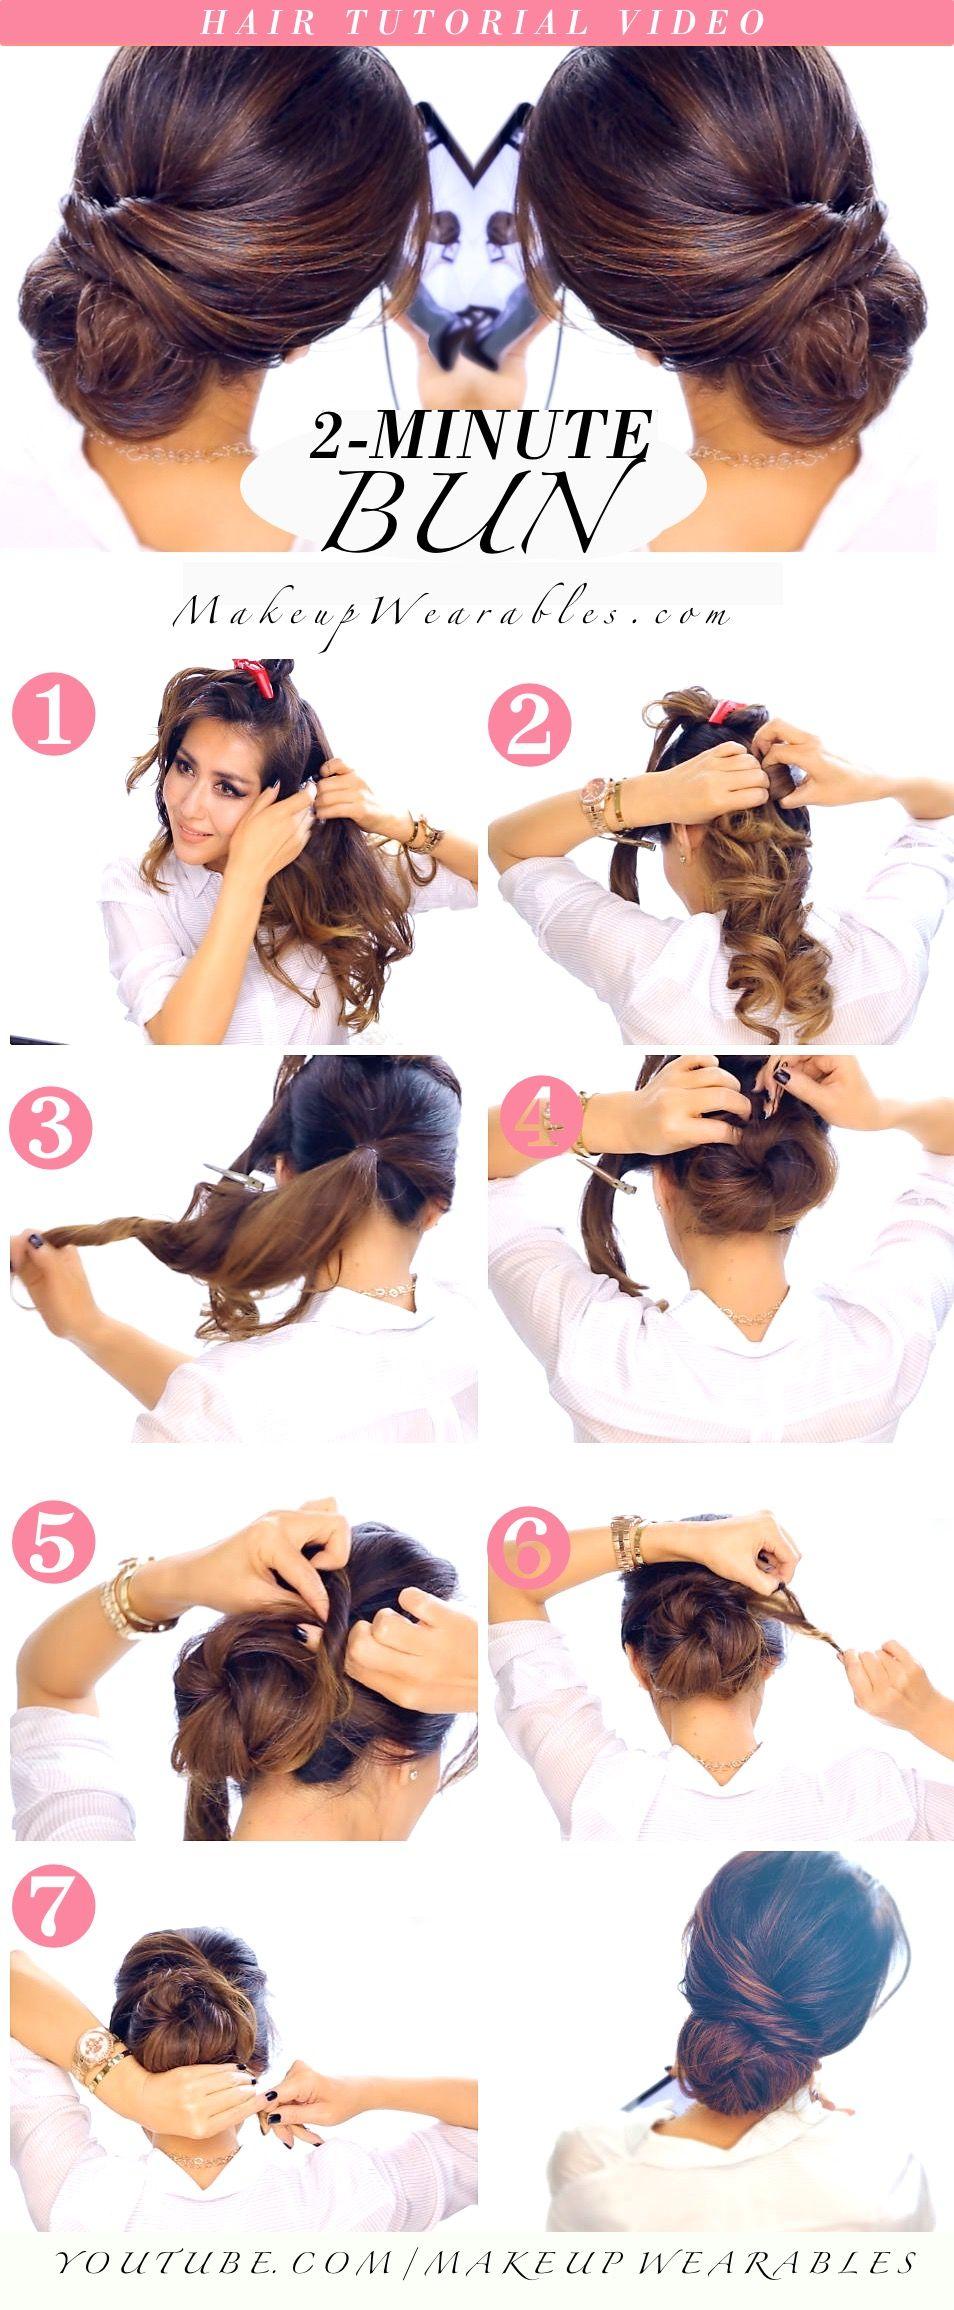 Peachy Elegant Bun Bun Hairstyles And Buns On Pinterest Hairstyles For Women Draintrainus